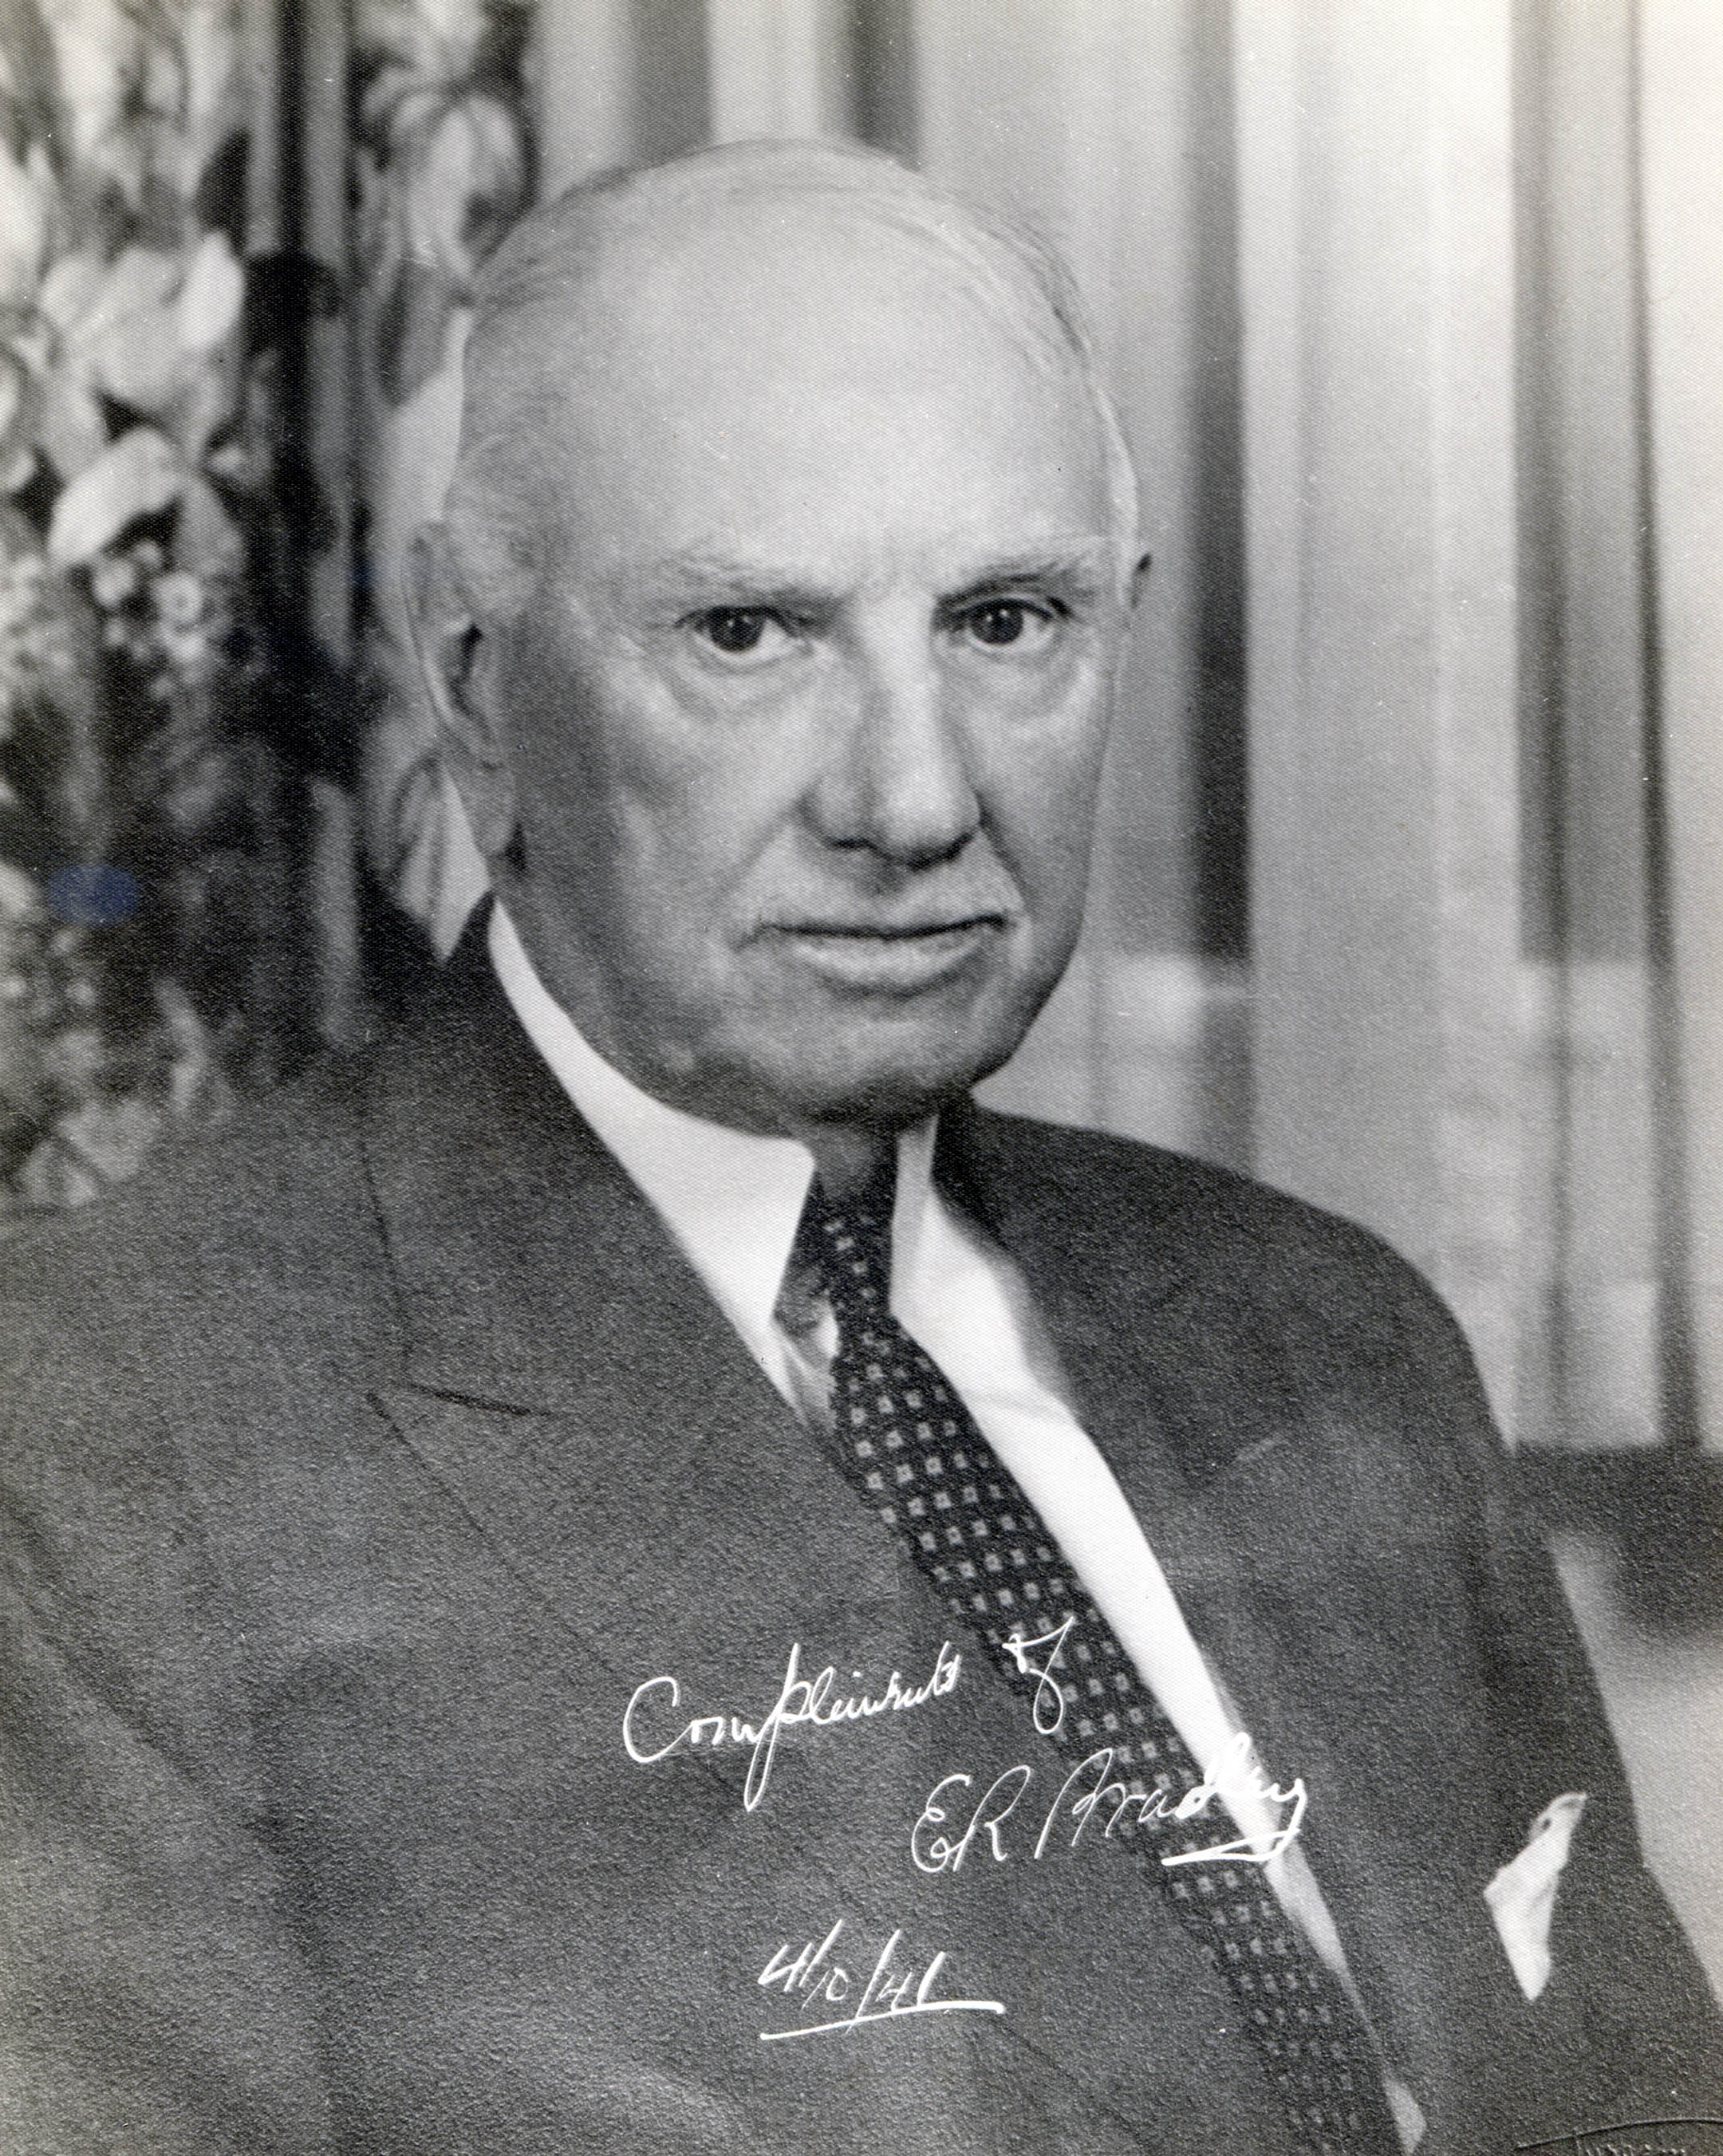 Portrait of E. R. Bradley, 1941 (Museum Collection)